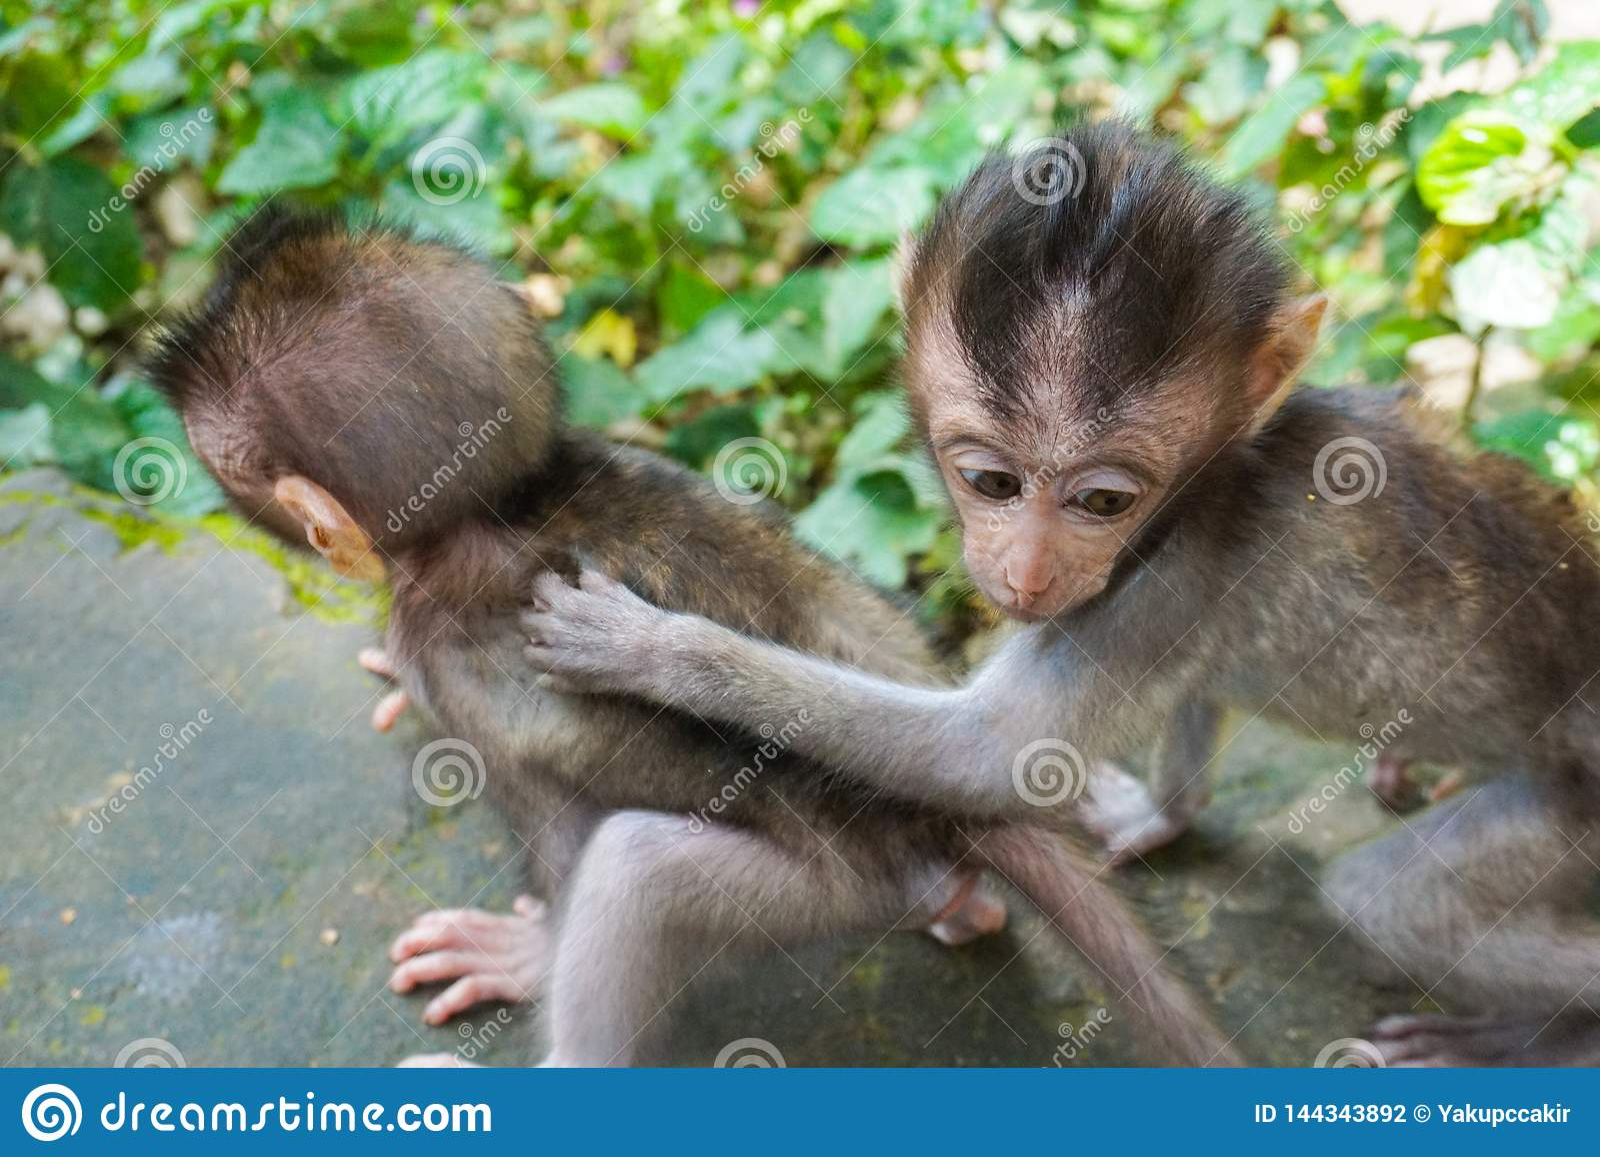 Adorable little baby macaque monkeys at Sacred Monkey Forest. Ubud, Bali, Indonesia